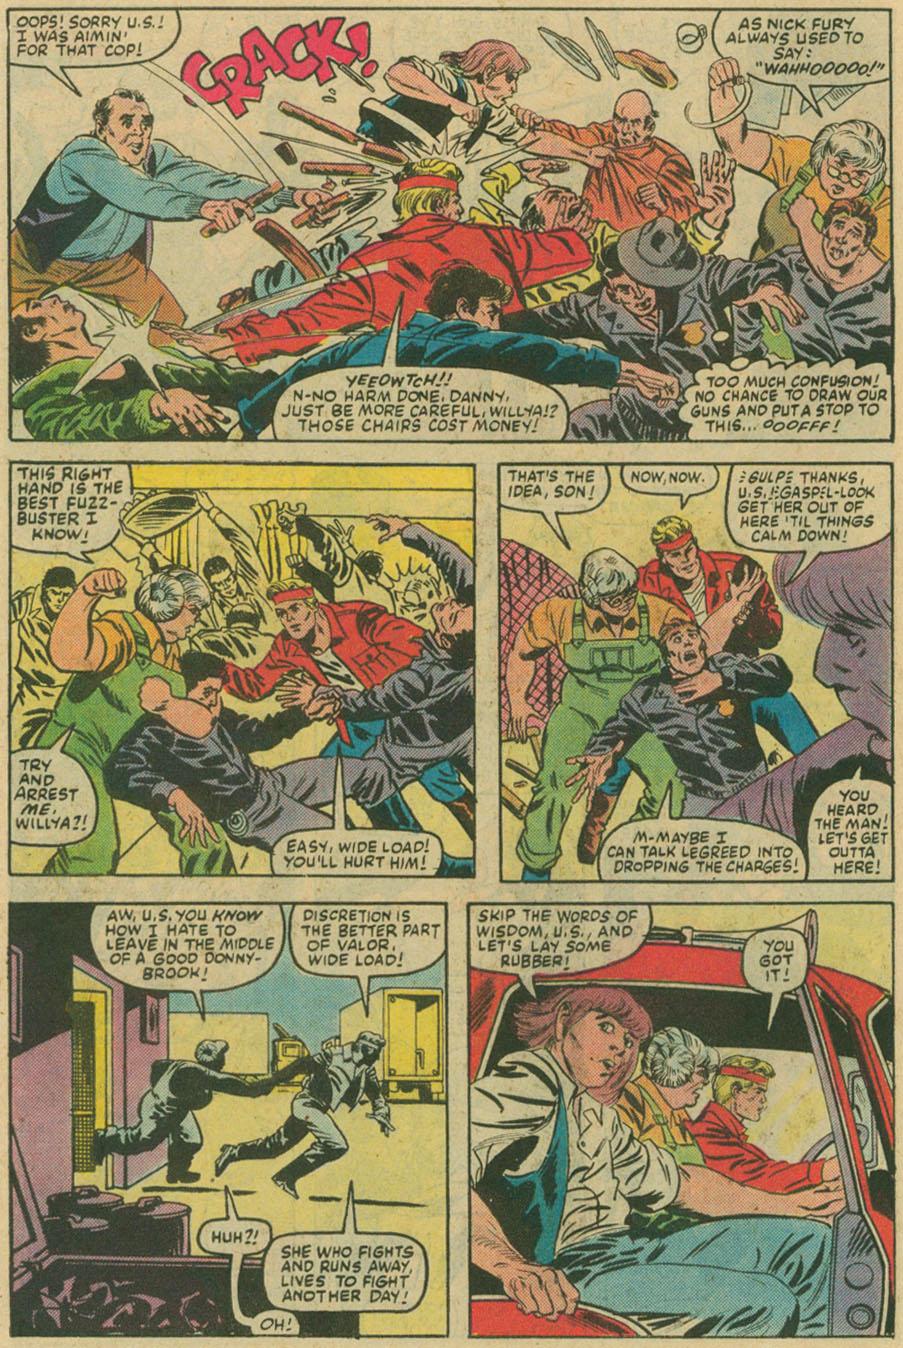 Read online U.S. 1 comic -  Issue #6 - 8